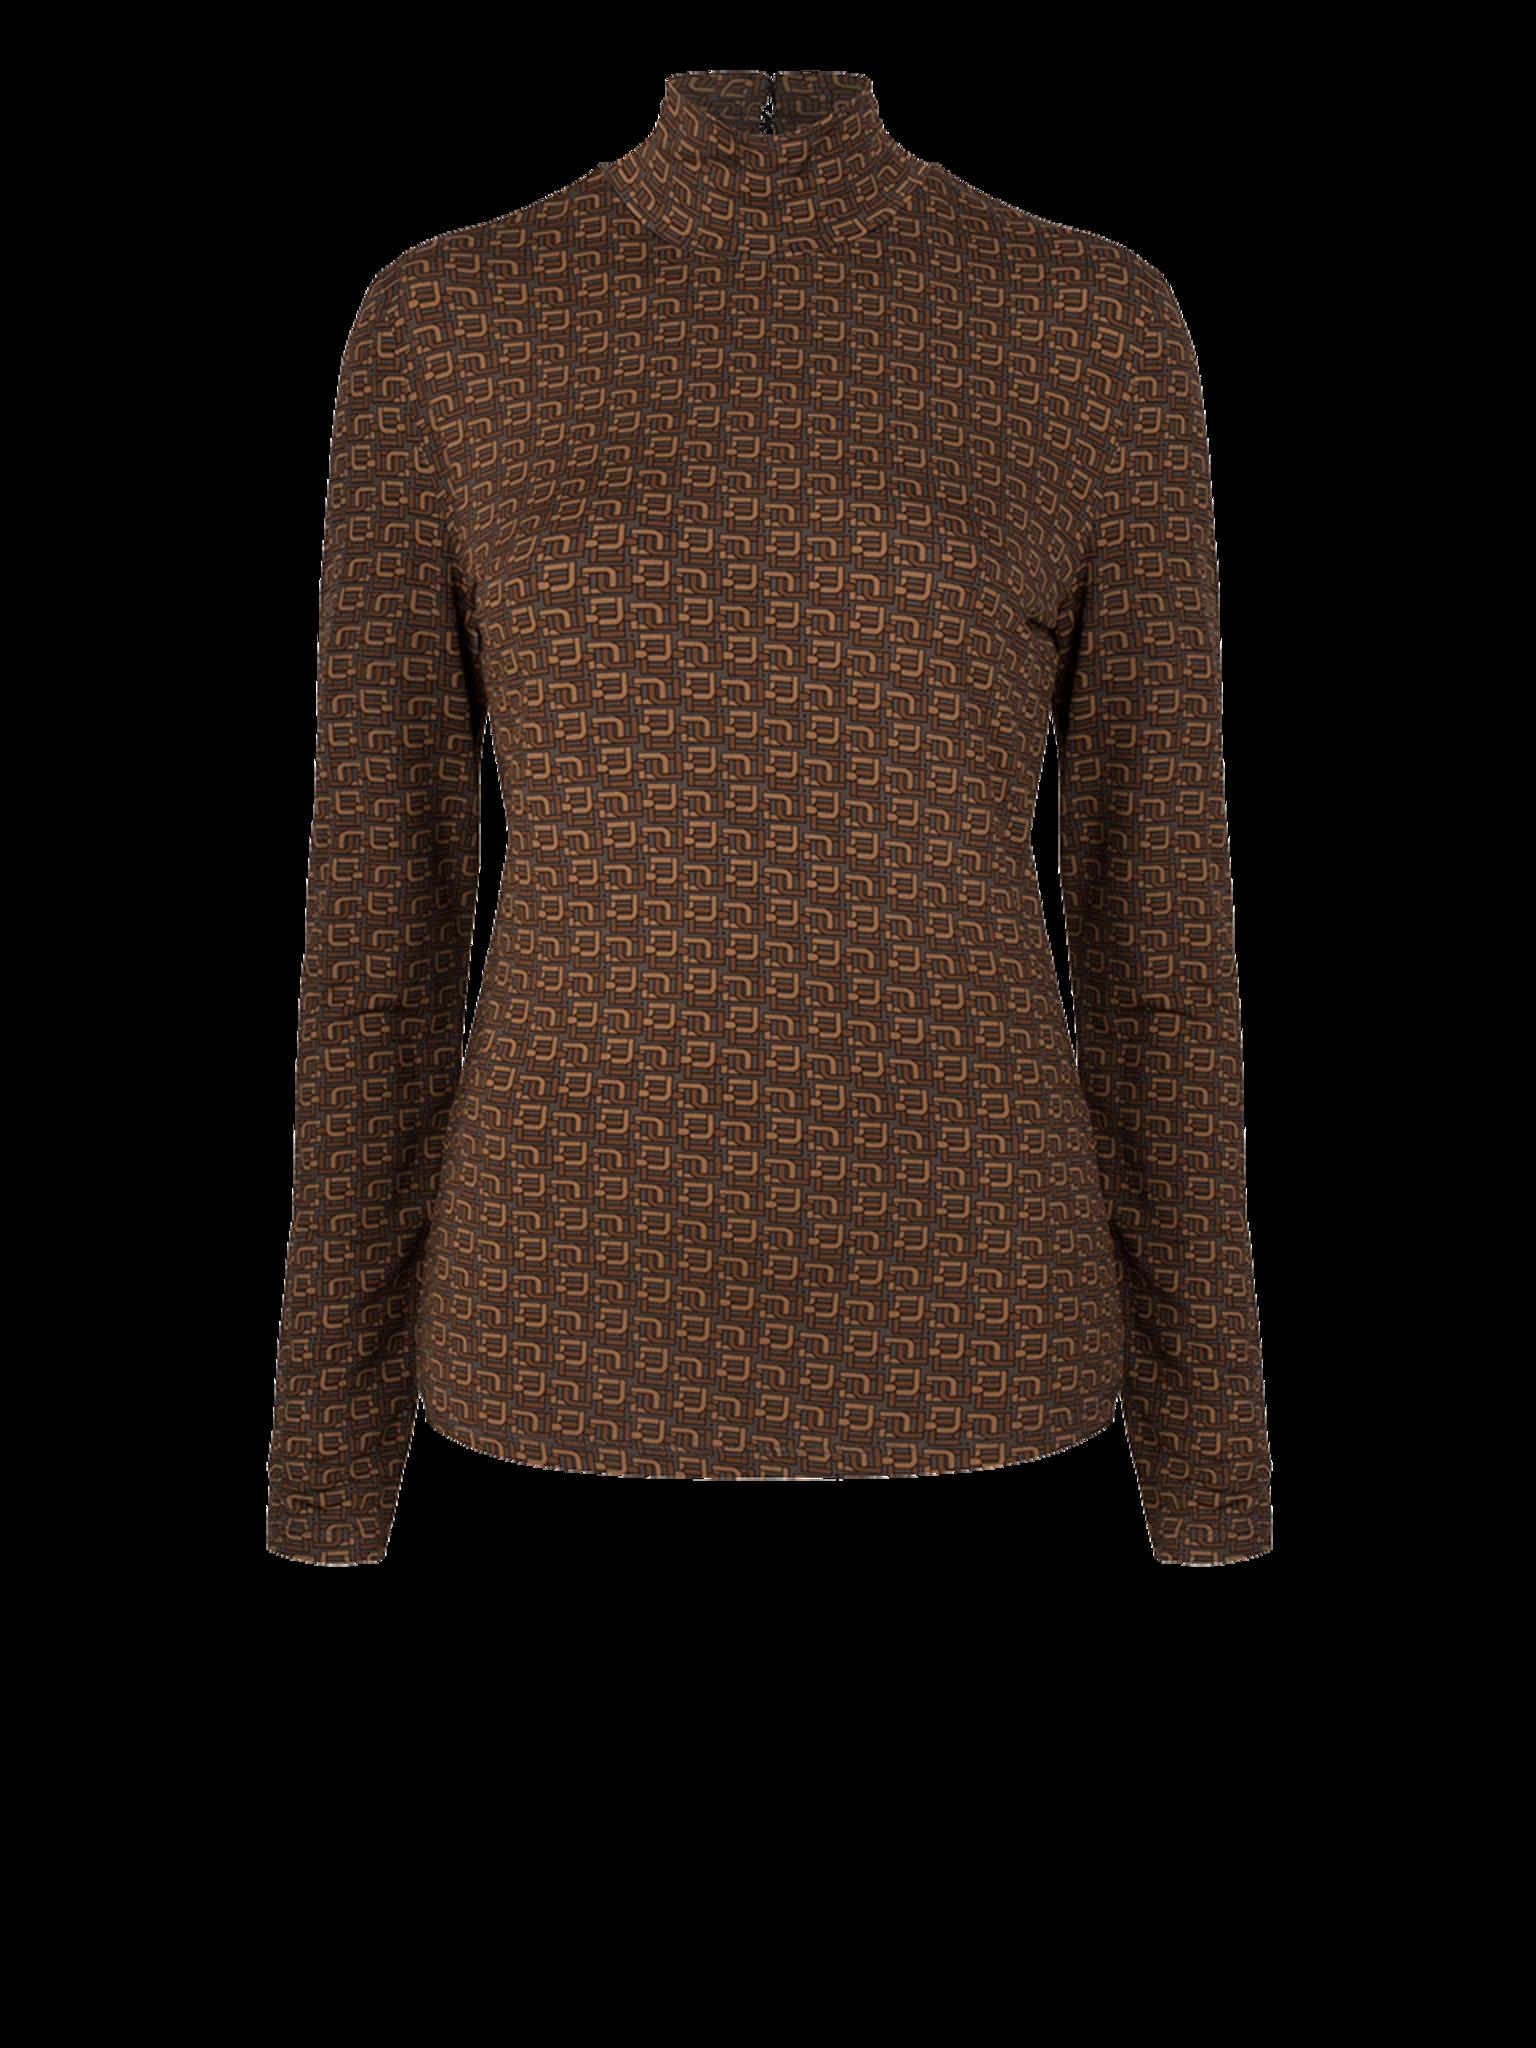 Dante 6 sweater 204607 ELVIS-1